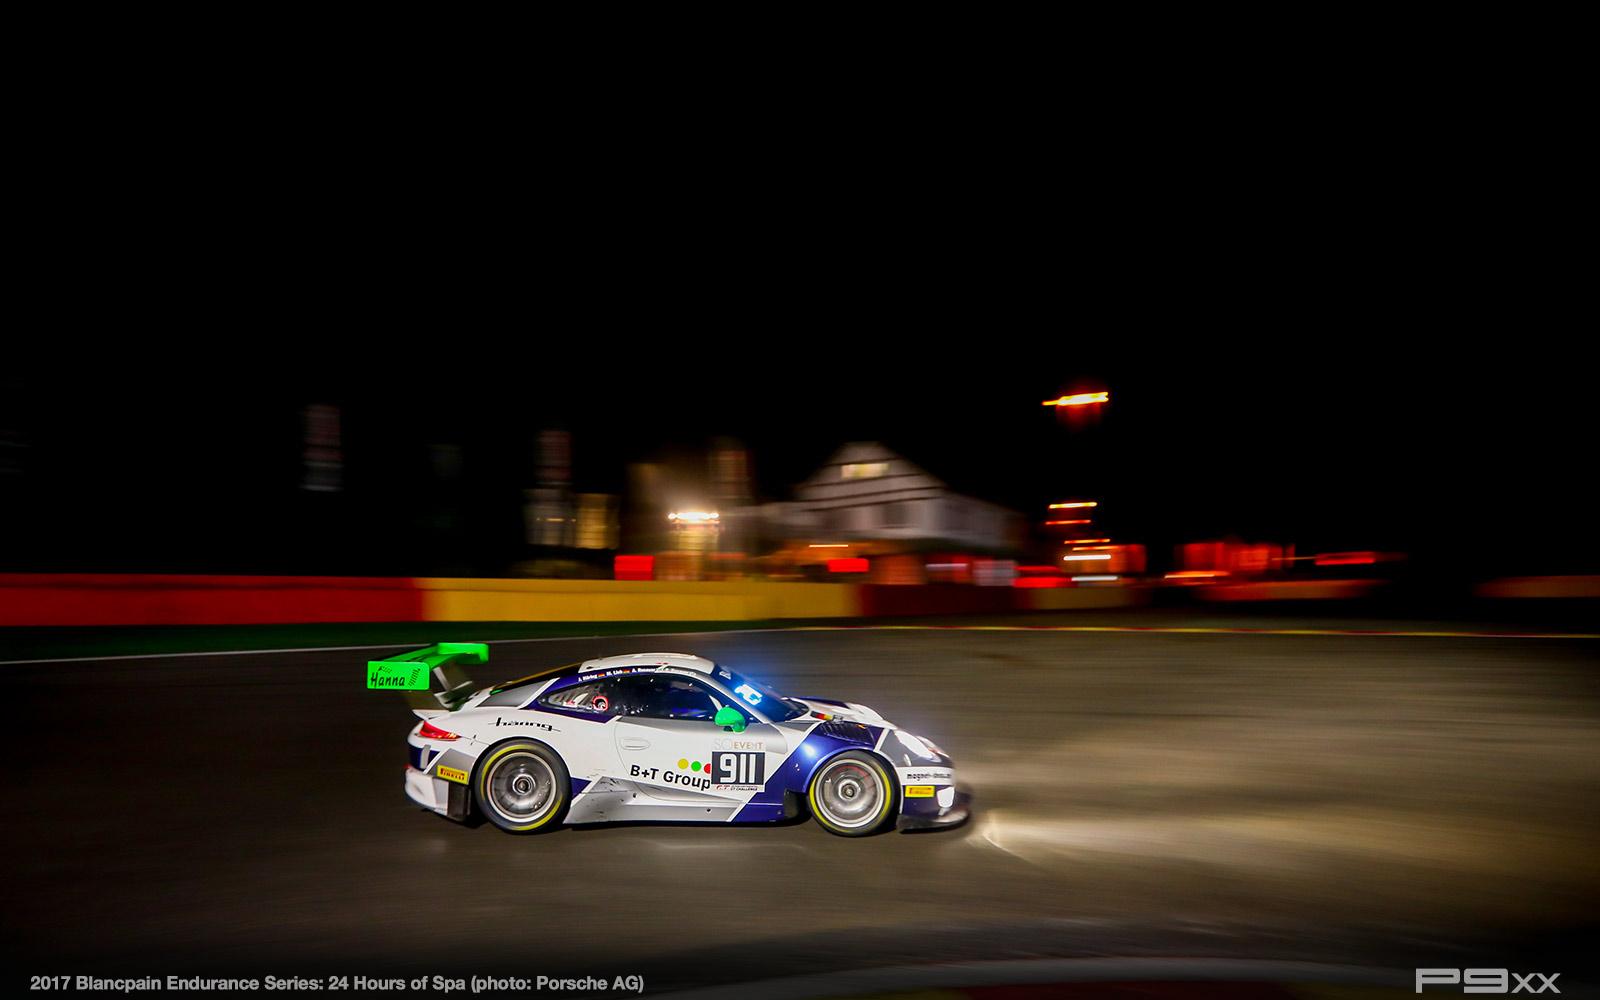 2017-24-Hours-of-Spa-Porsche-324